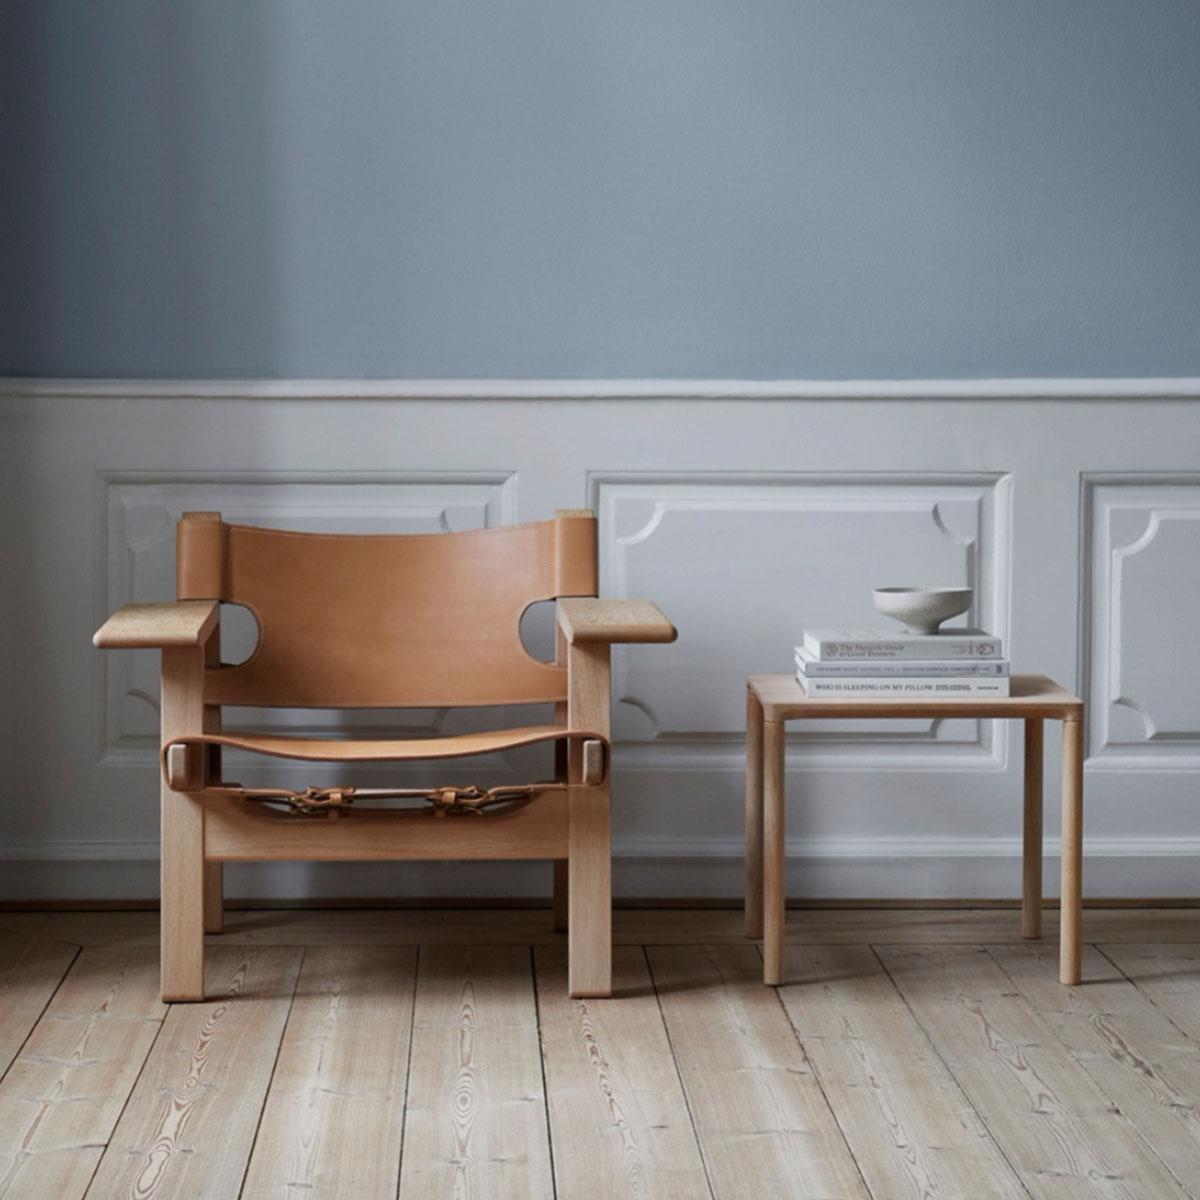 310_spanish-chair.jpg